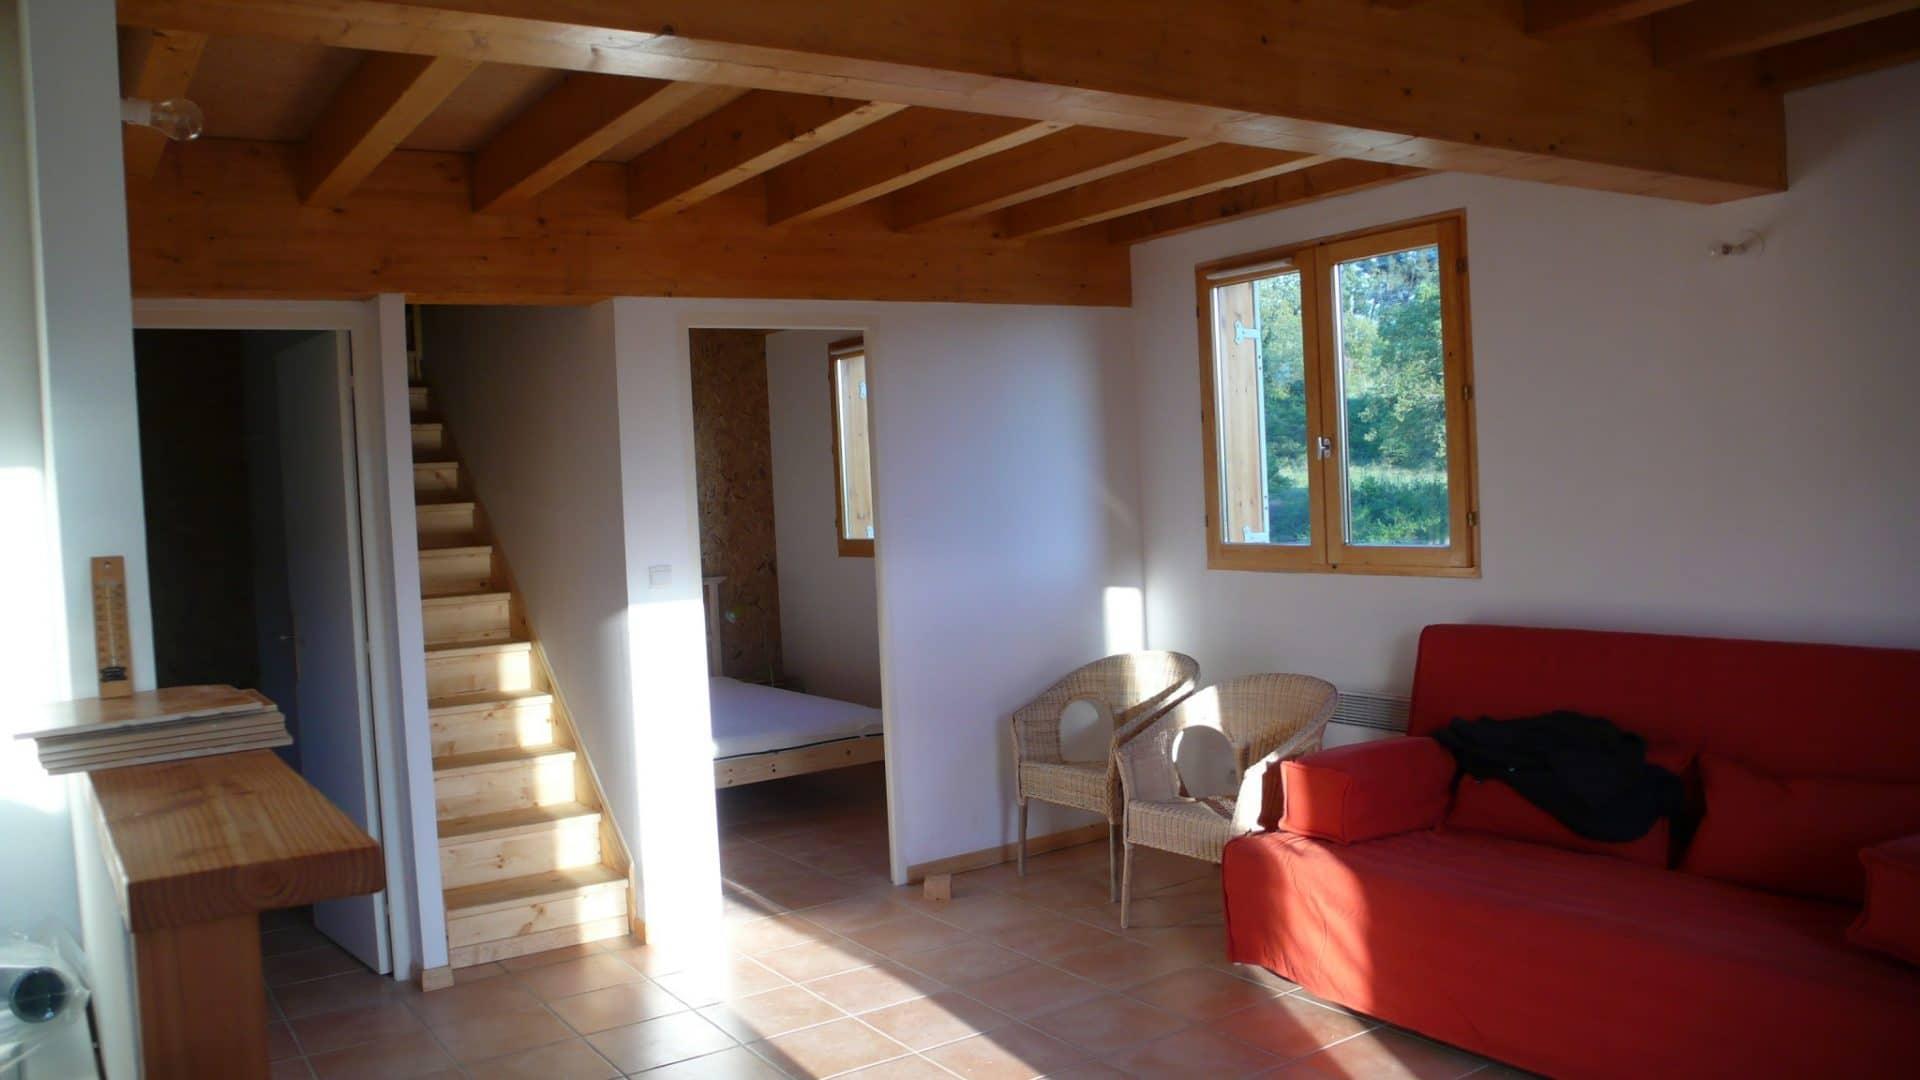 la maison de bea solari architecte. Black Bedroom Furniture Sets. Home Design Ideas